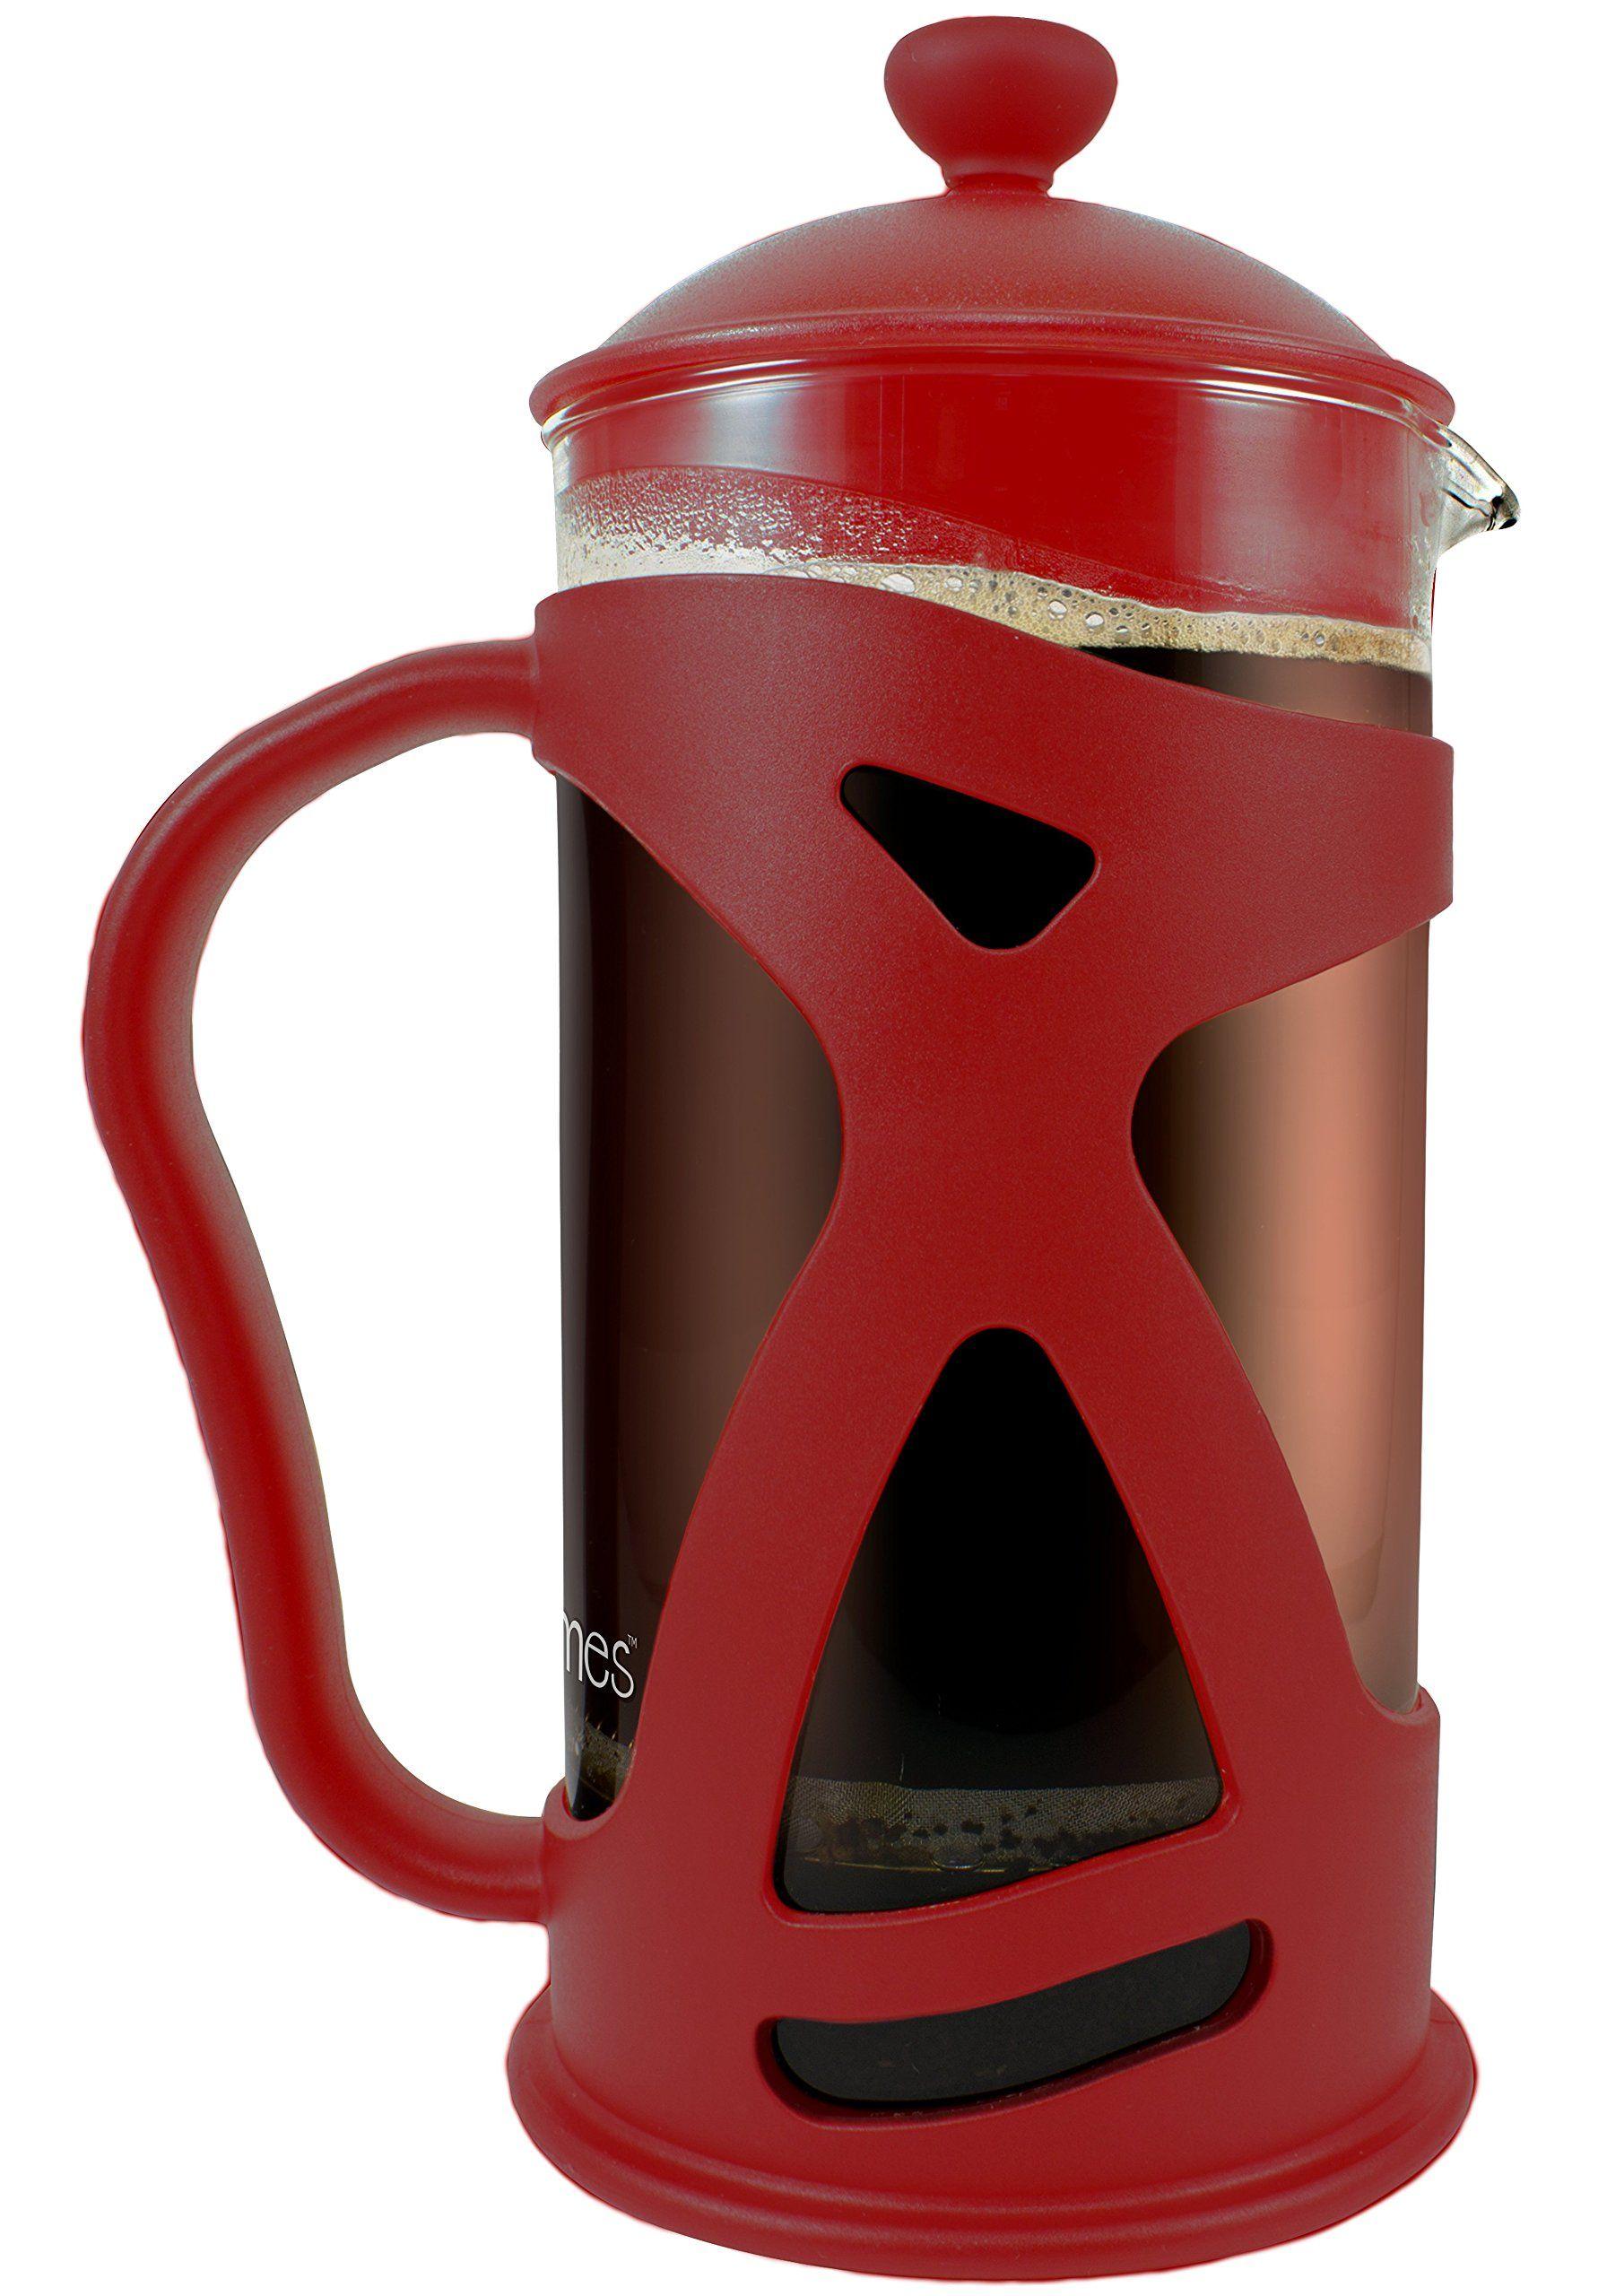 KONA French Press Tea & Espresso Coffee Maker, 34oz Red